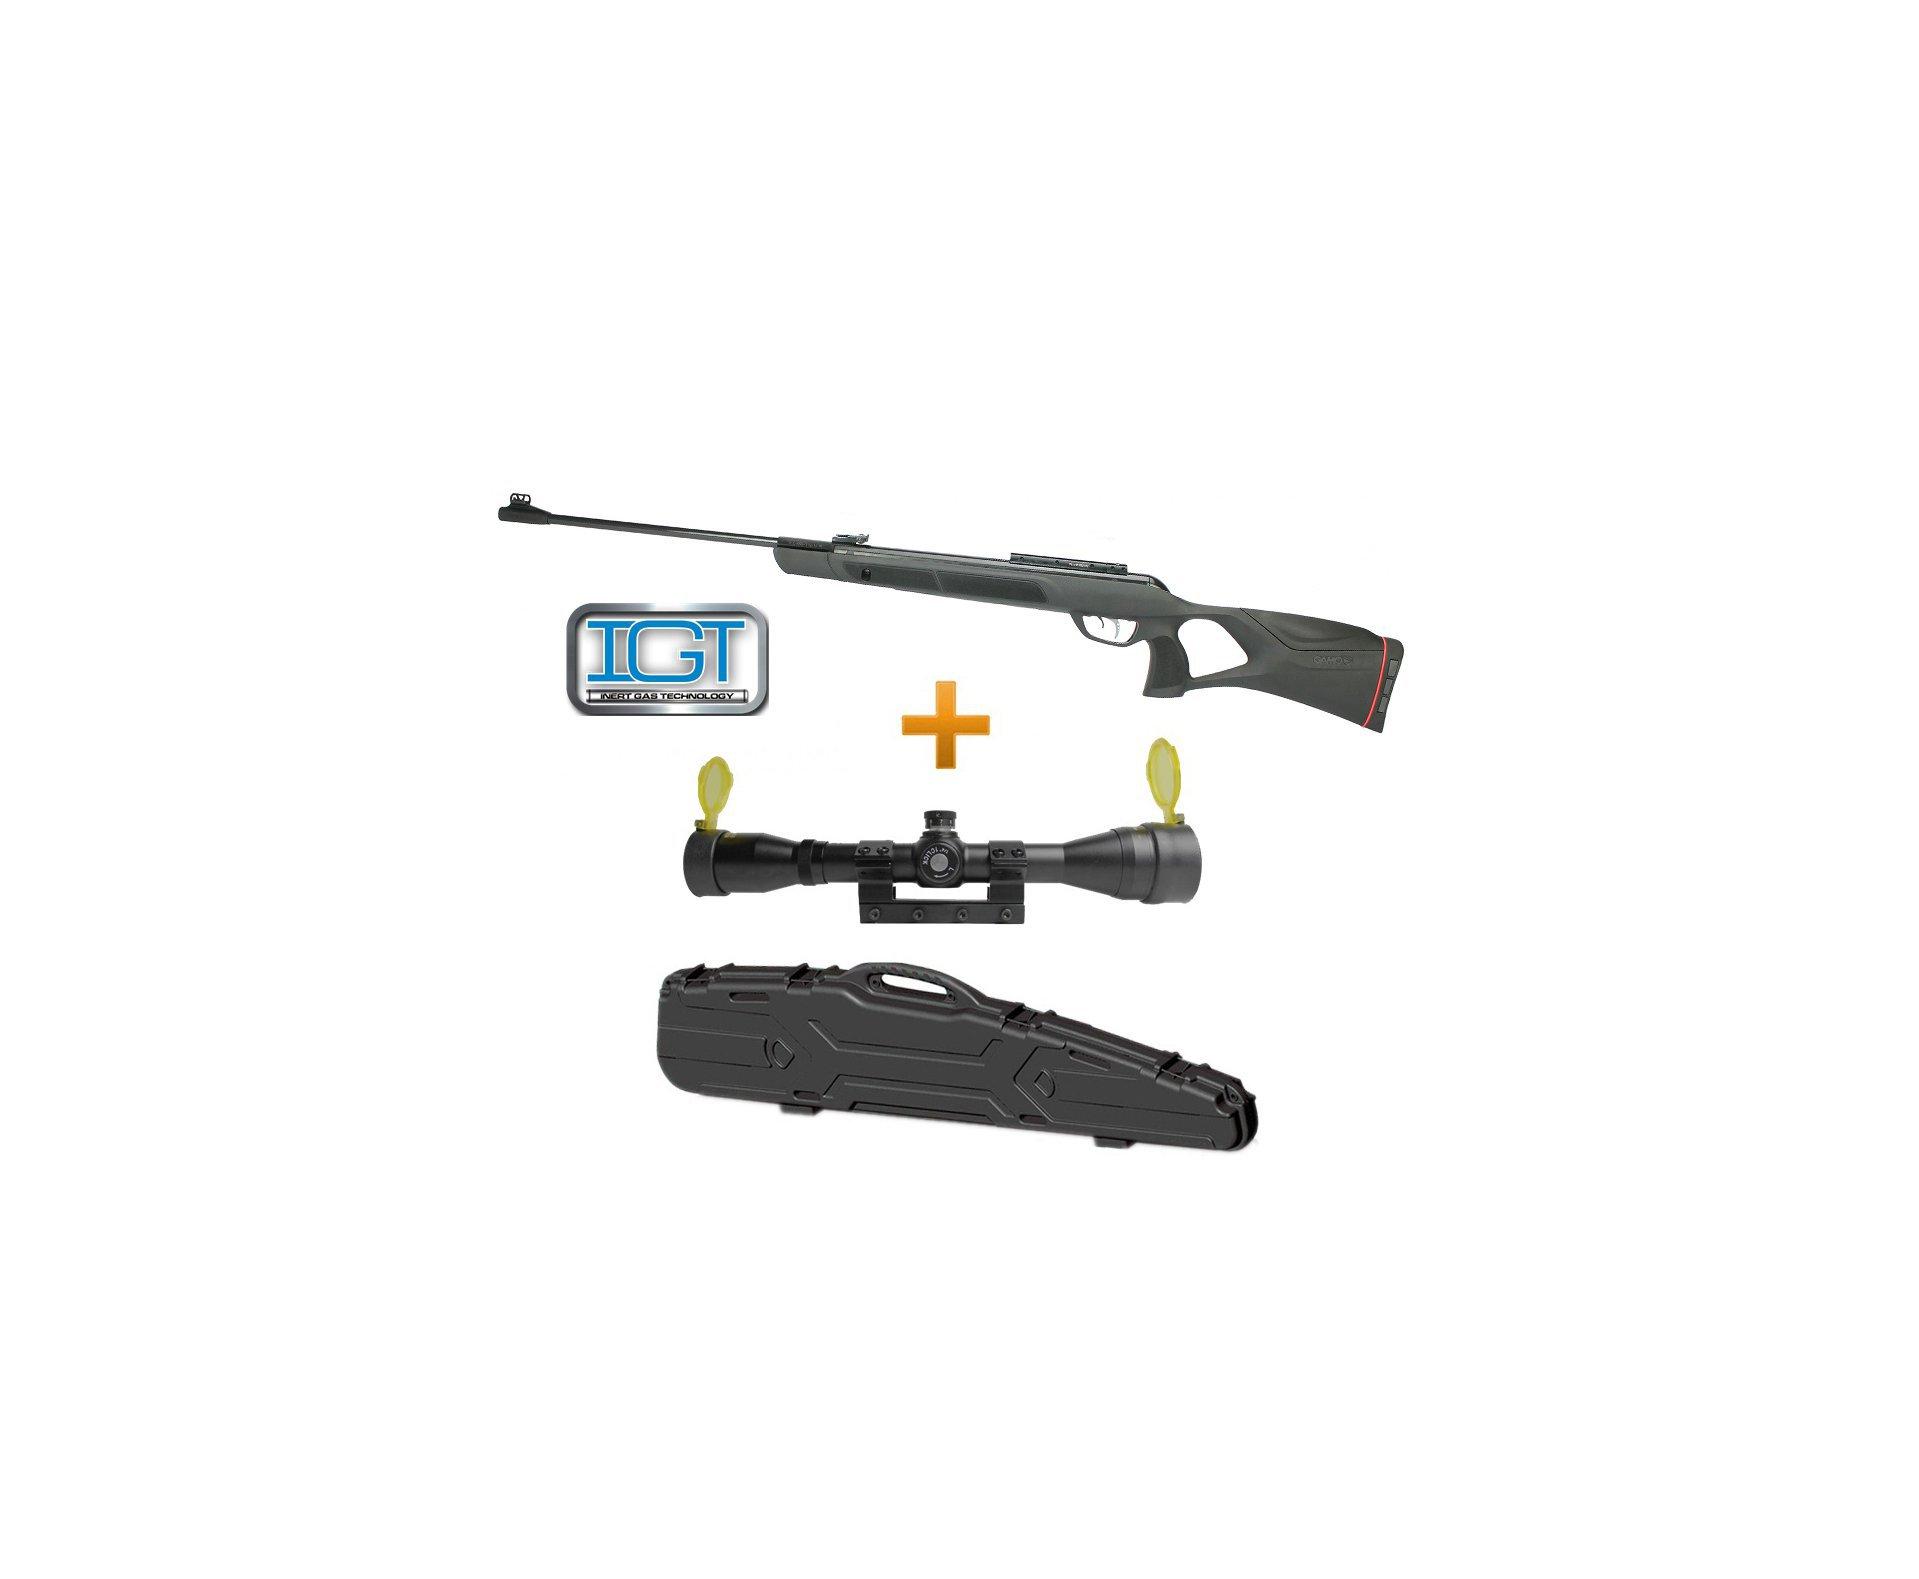 Carabina De Pressão G-magnum 1250 Igt Mach 1 Gas Ram Cal 5,5mm + Luneta 4x32 Gold Rossi + Case - Gamo